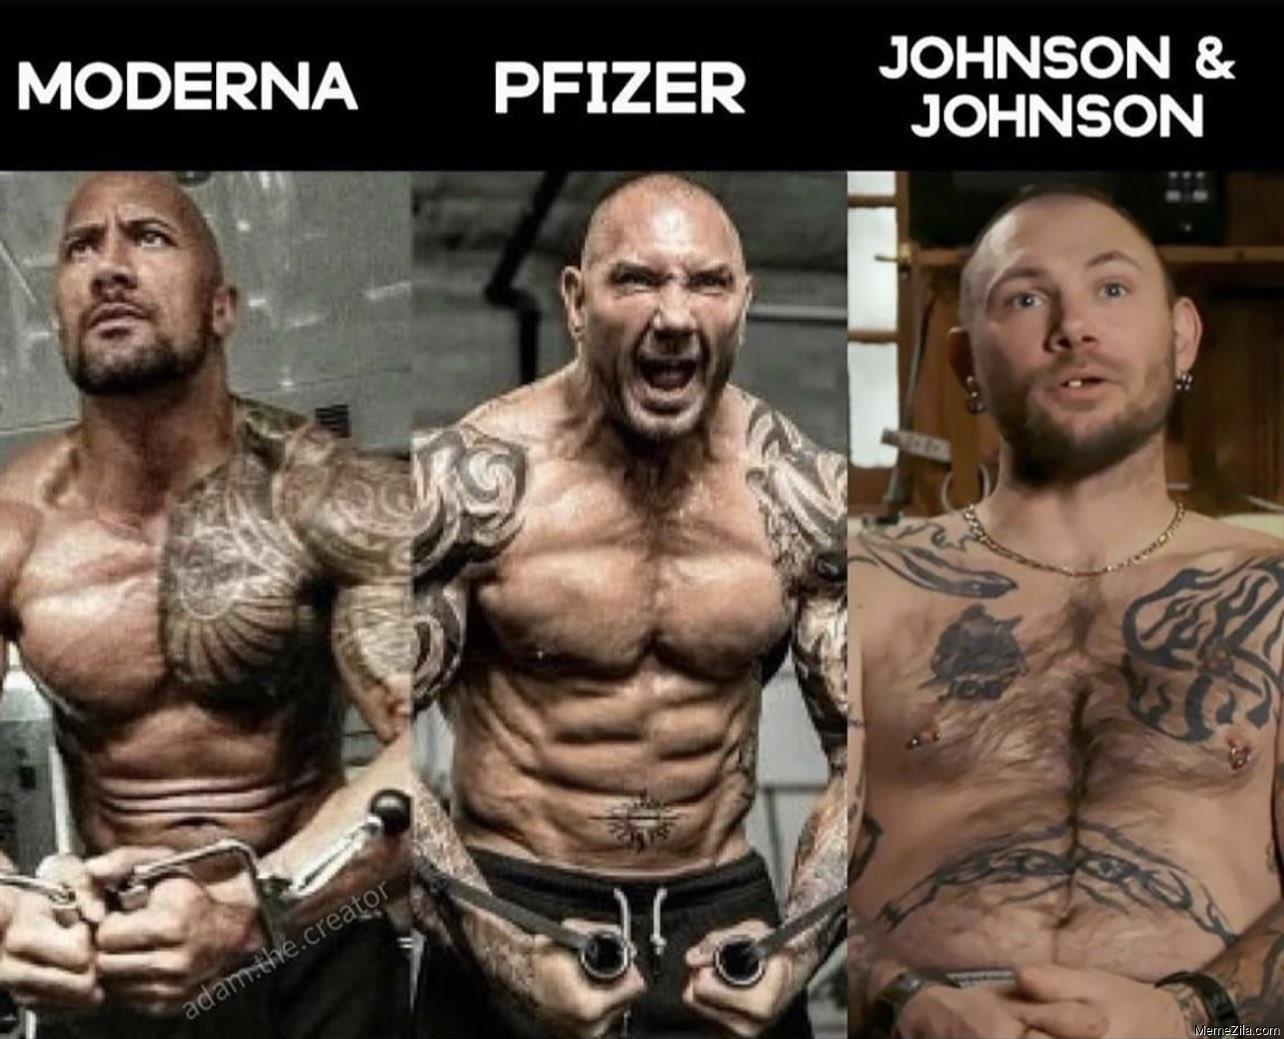 Pfizer Moderna Johnson and Johnson meme